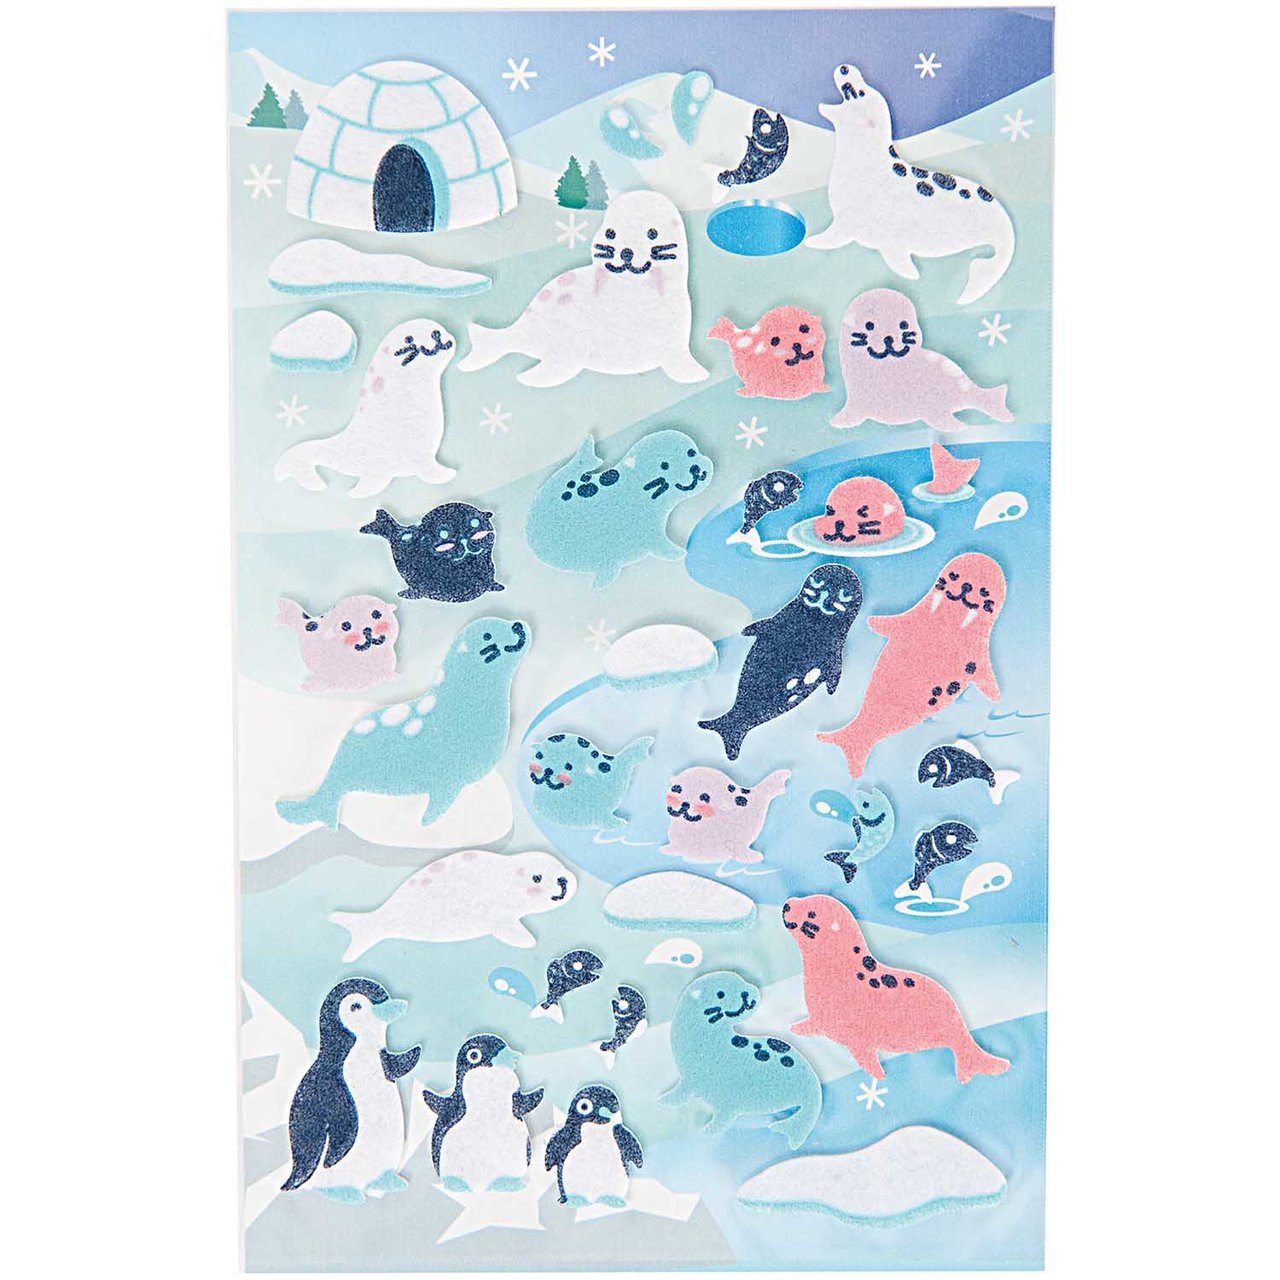 Paper Poetry Filzsticker Robben-Pinguine